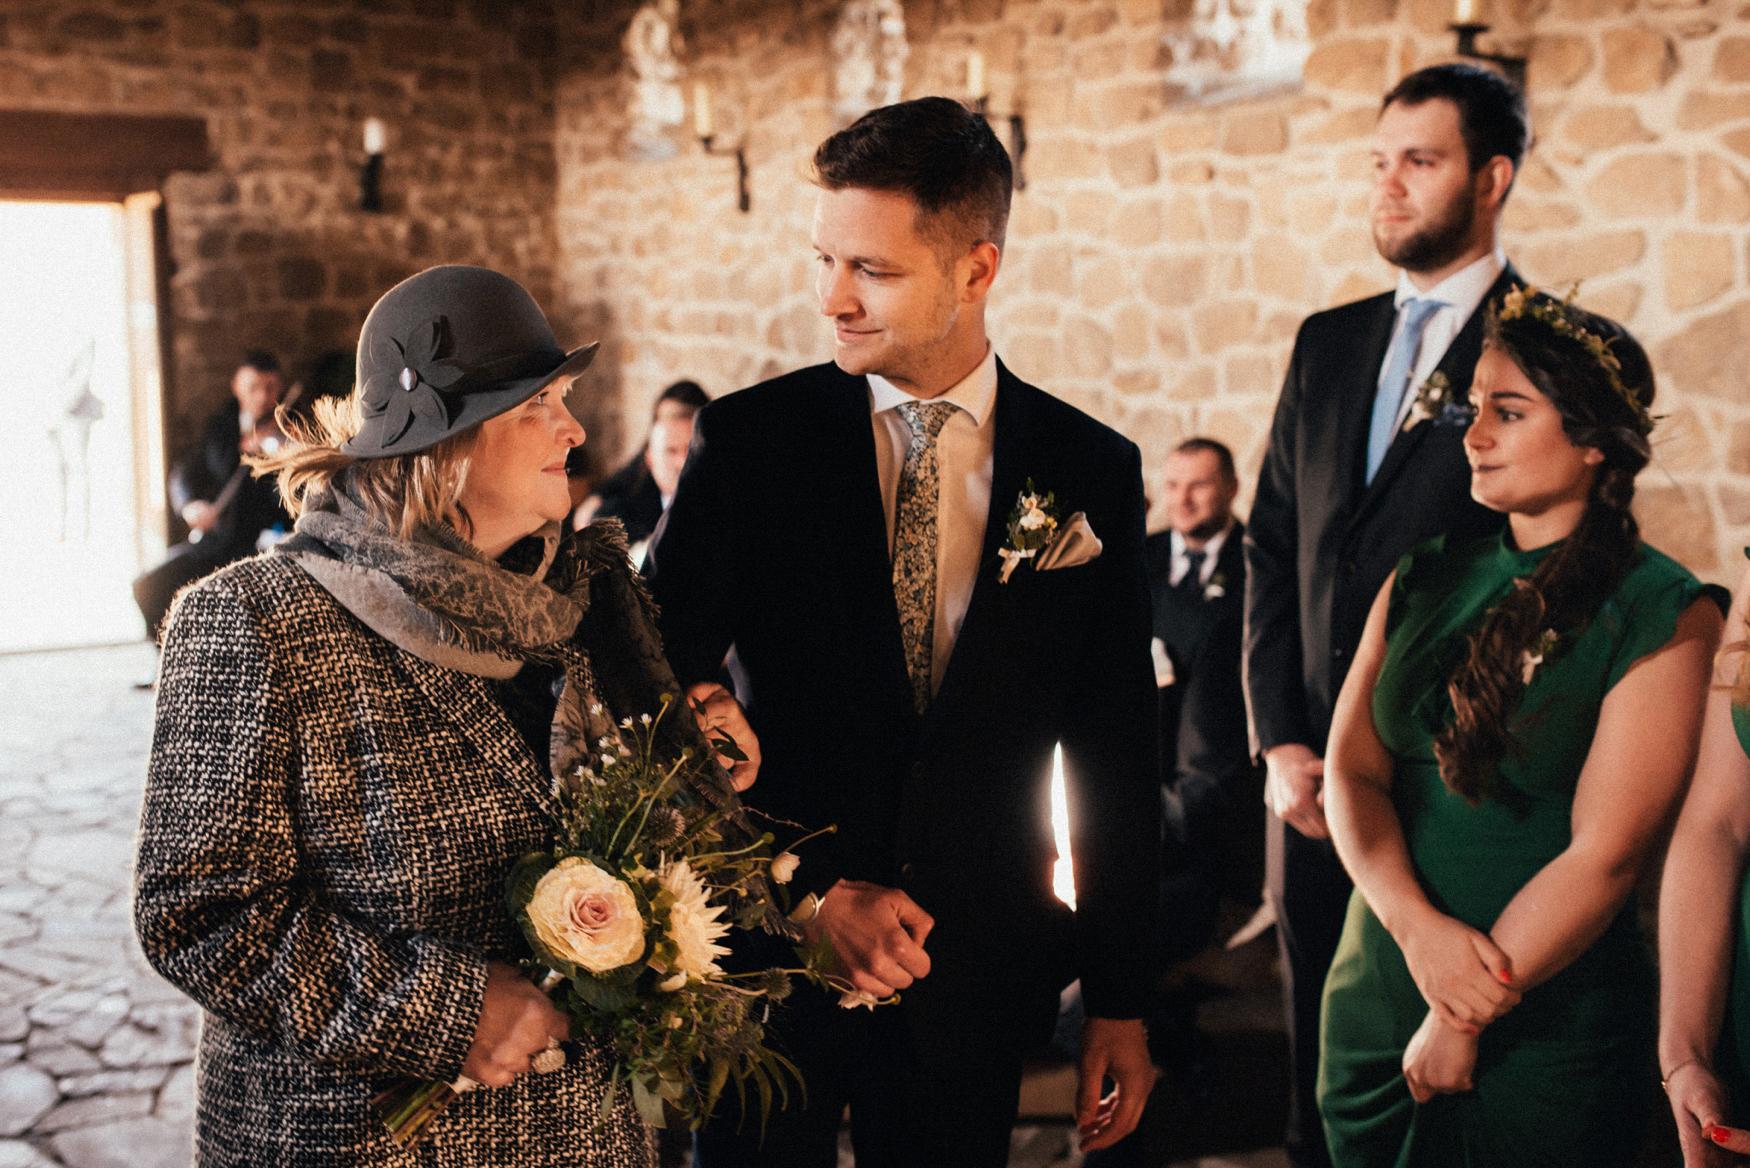 2 prague wedding photographer - boho svatba zikmundov008.jpg